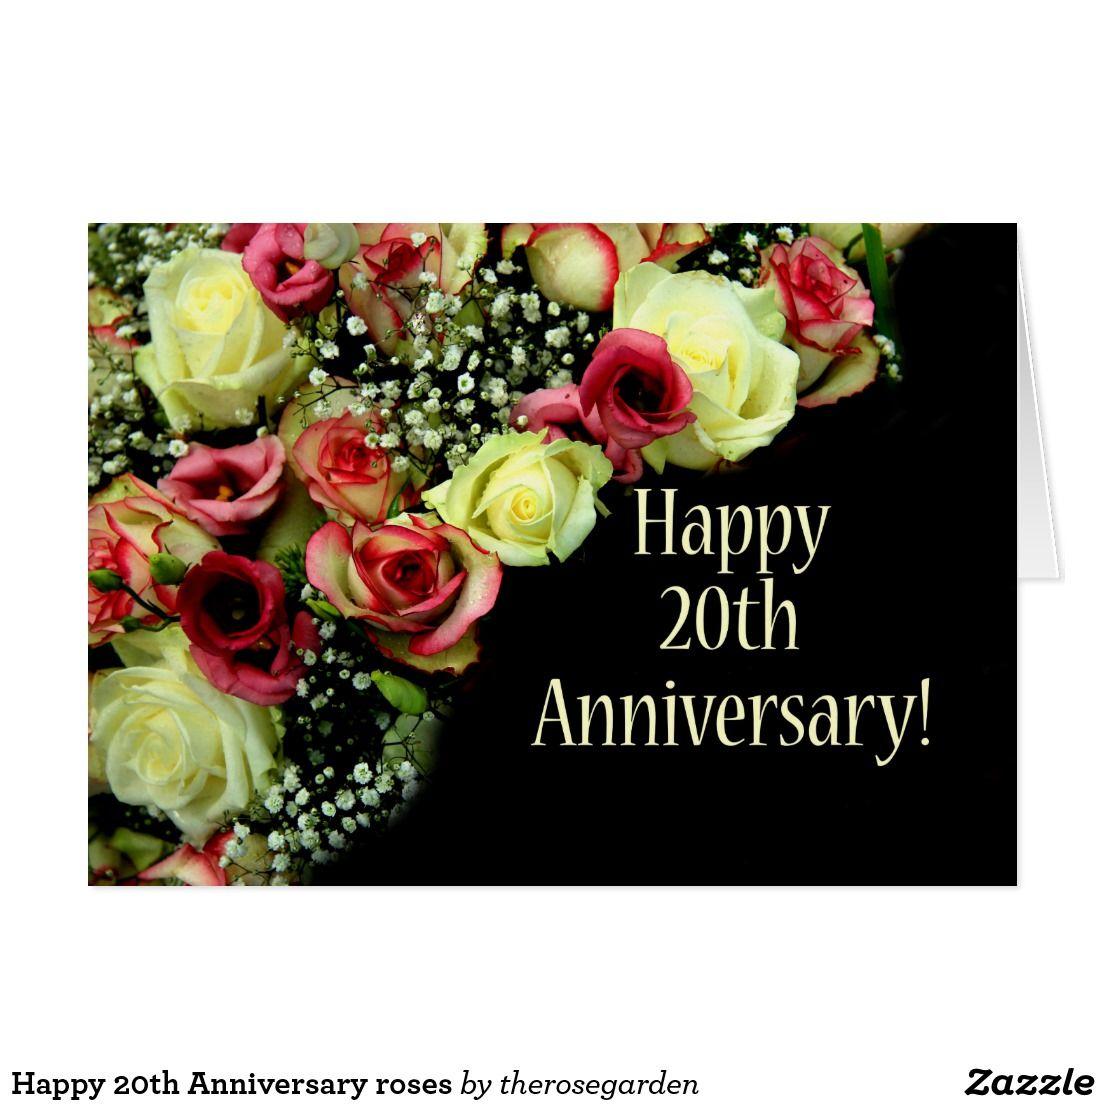 Happy 20th Anniversary Roses Card Zazzle Com Happy 20th Anniversary Happy 50th Anniversary Happy 70th Anniversary